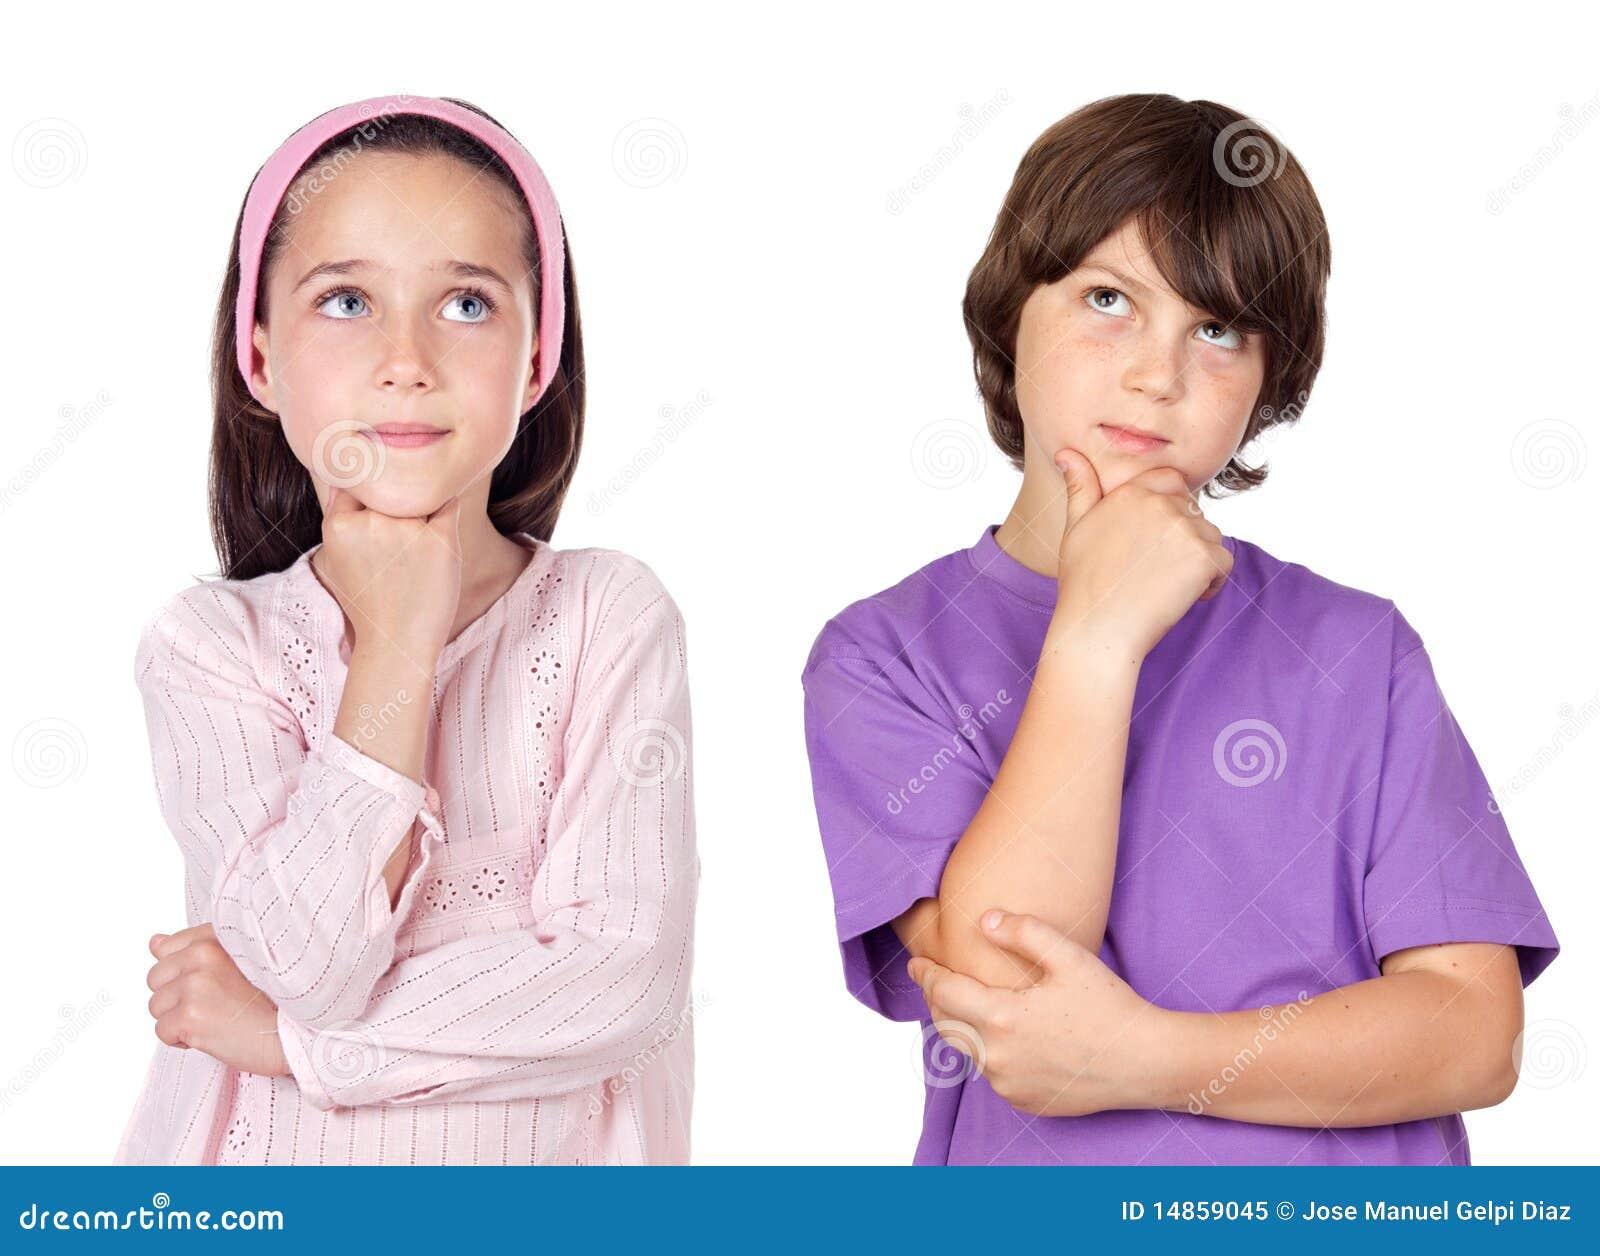 Thoughtful children